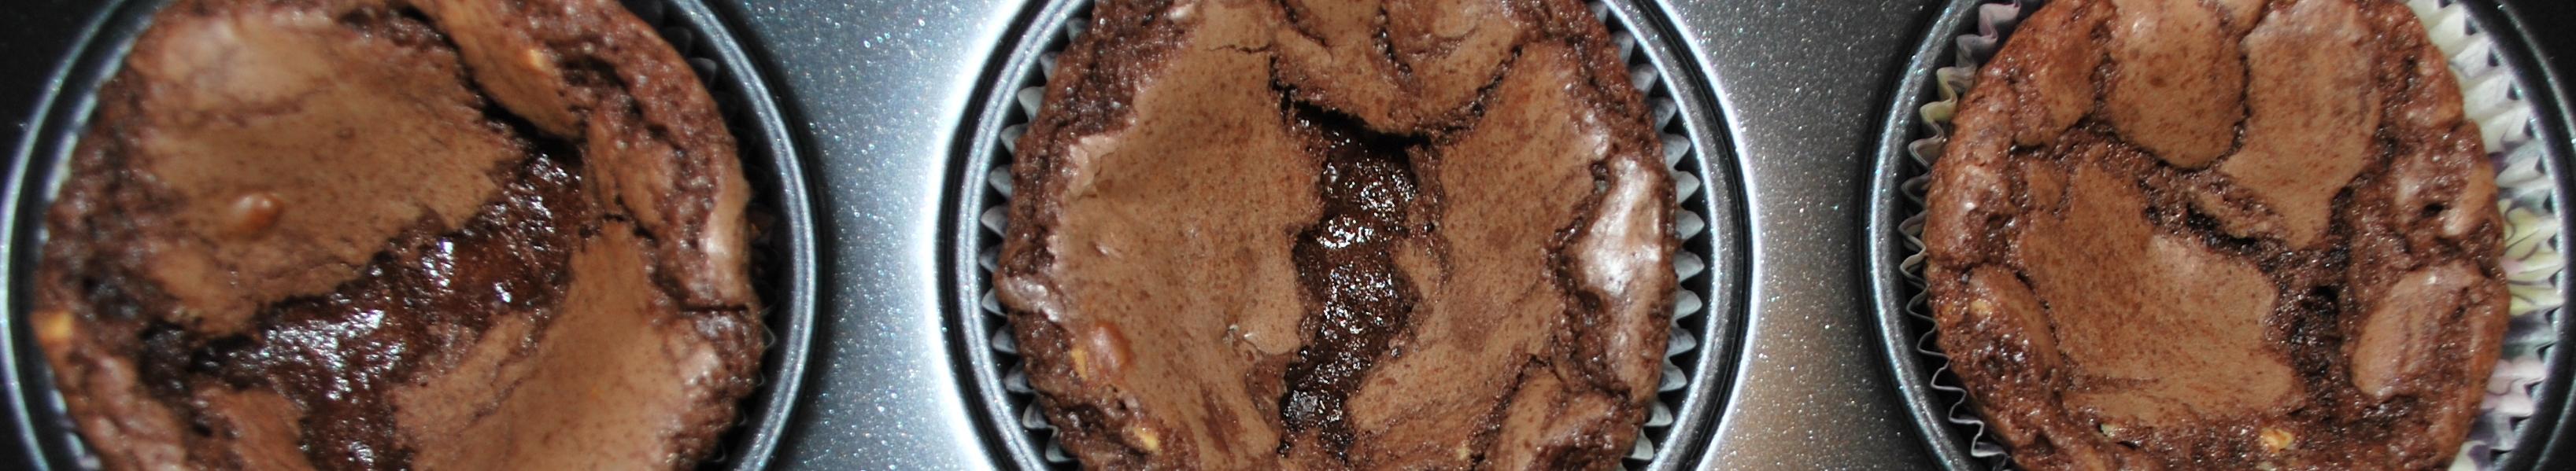 choklad muffins med choklad